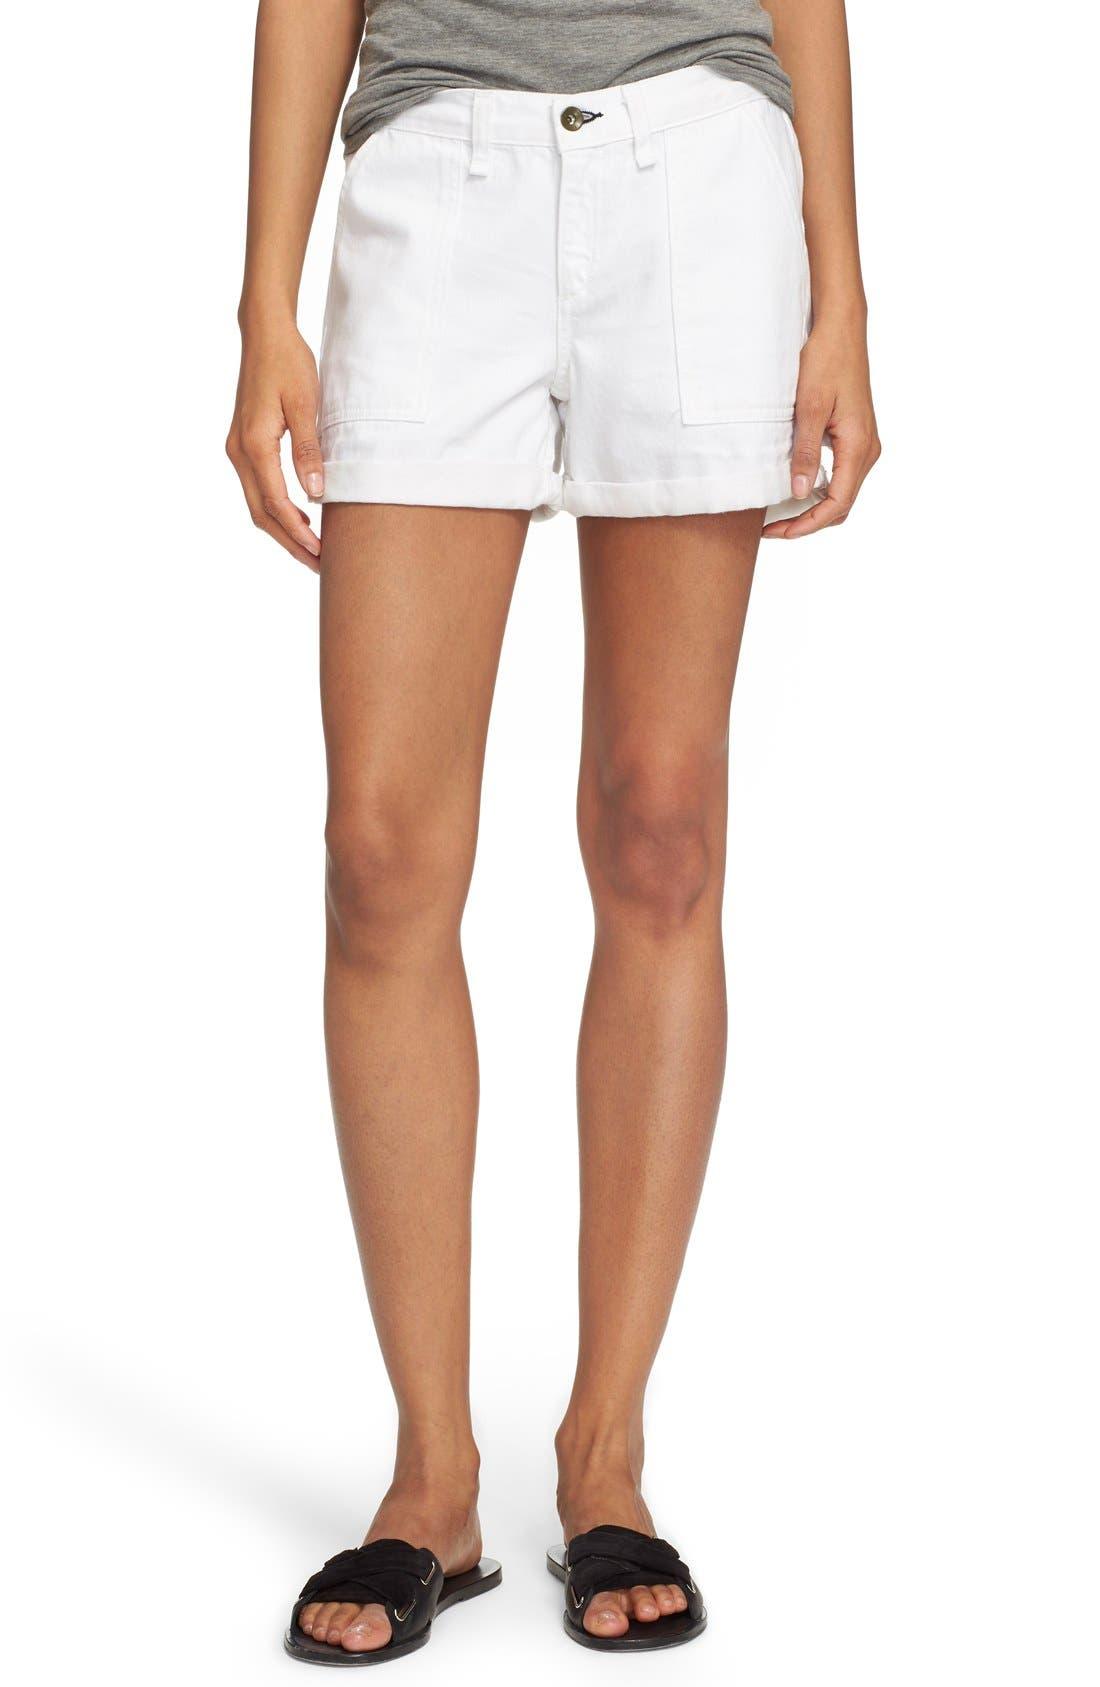 Alternate Image 1 Selected - rag & bone/JEAN 'Carpenter' Cuffed Denim Shorts (Aged Bright White)